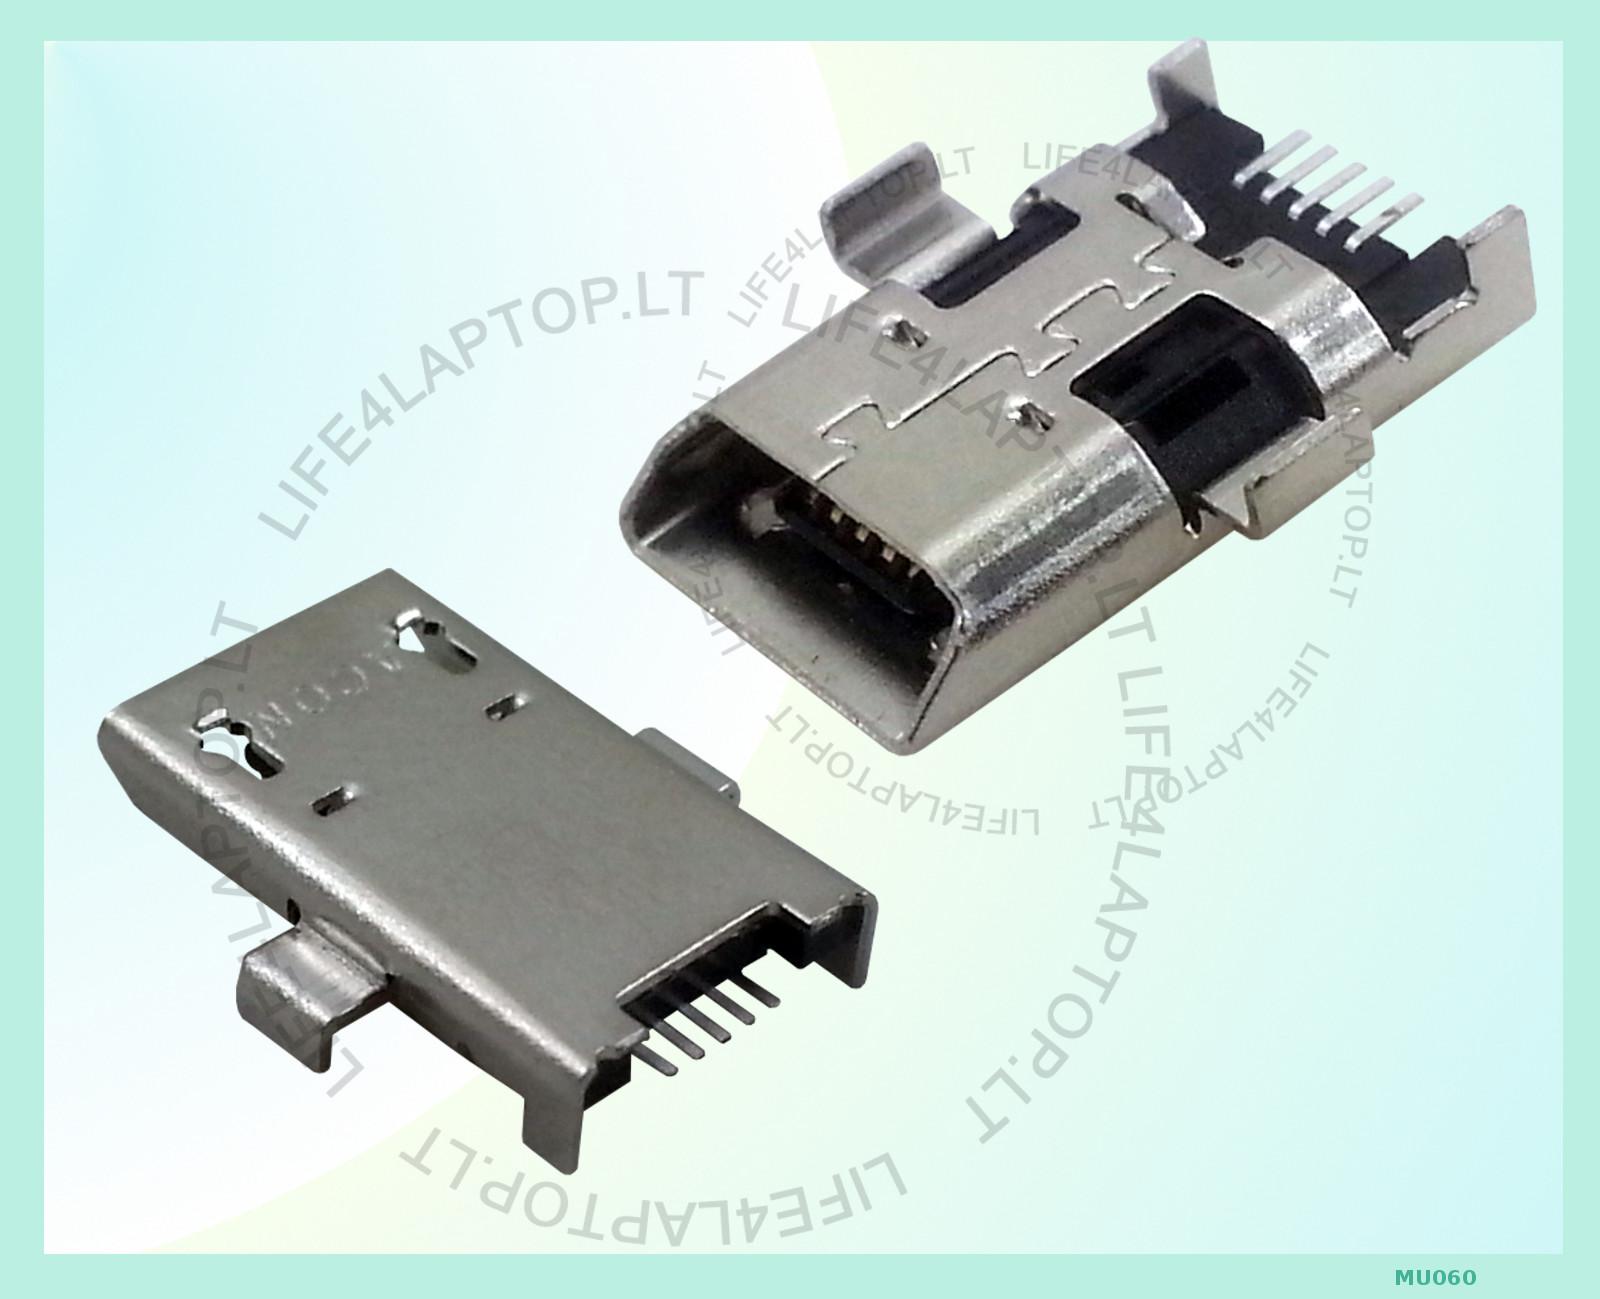 Mikro USB DC Stecker Buchse Stromanschluss Ladegerät Asus MEMO Pad ...